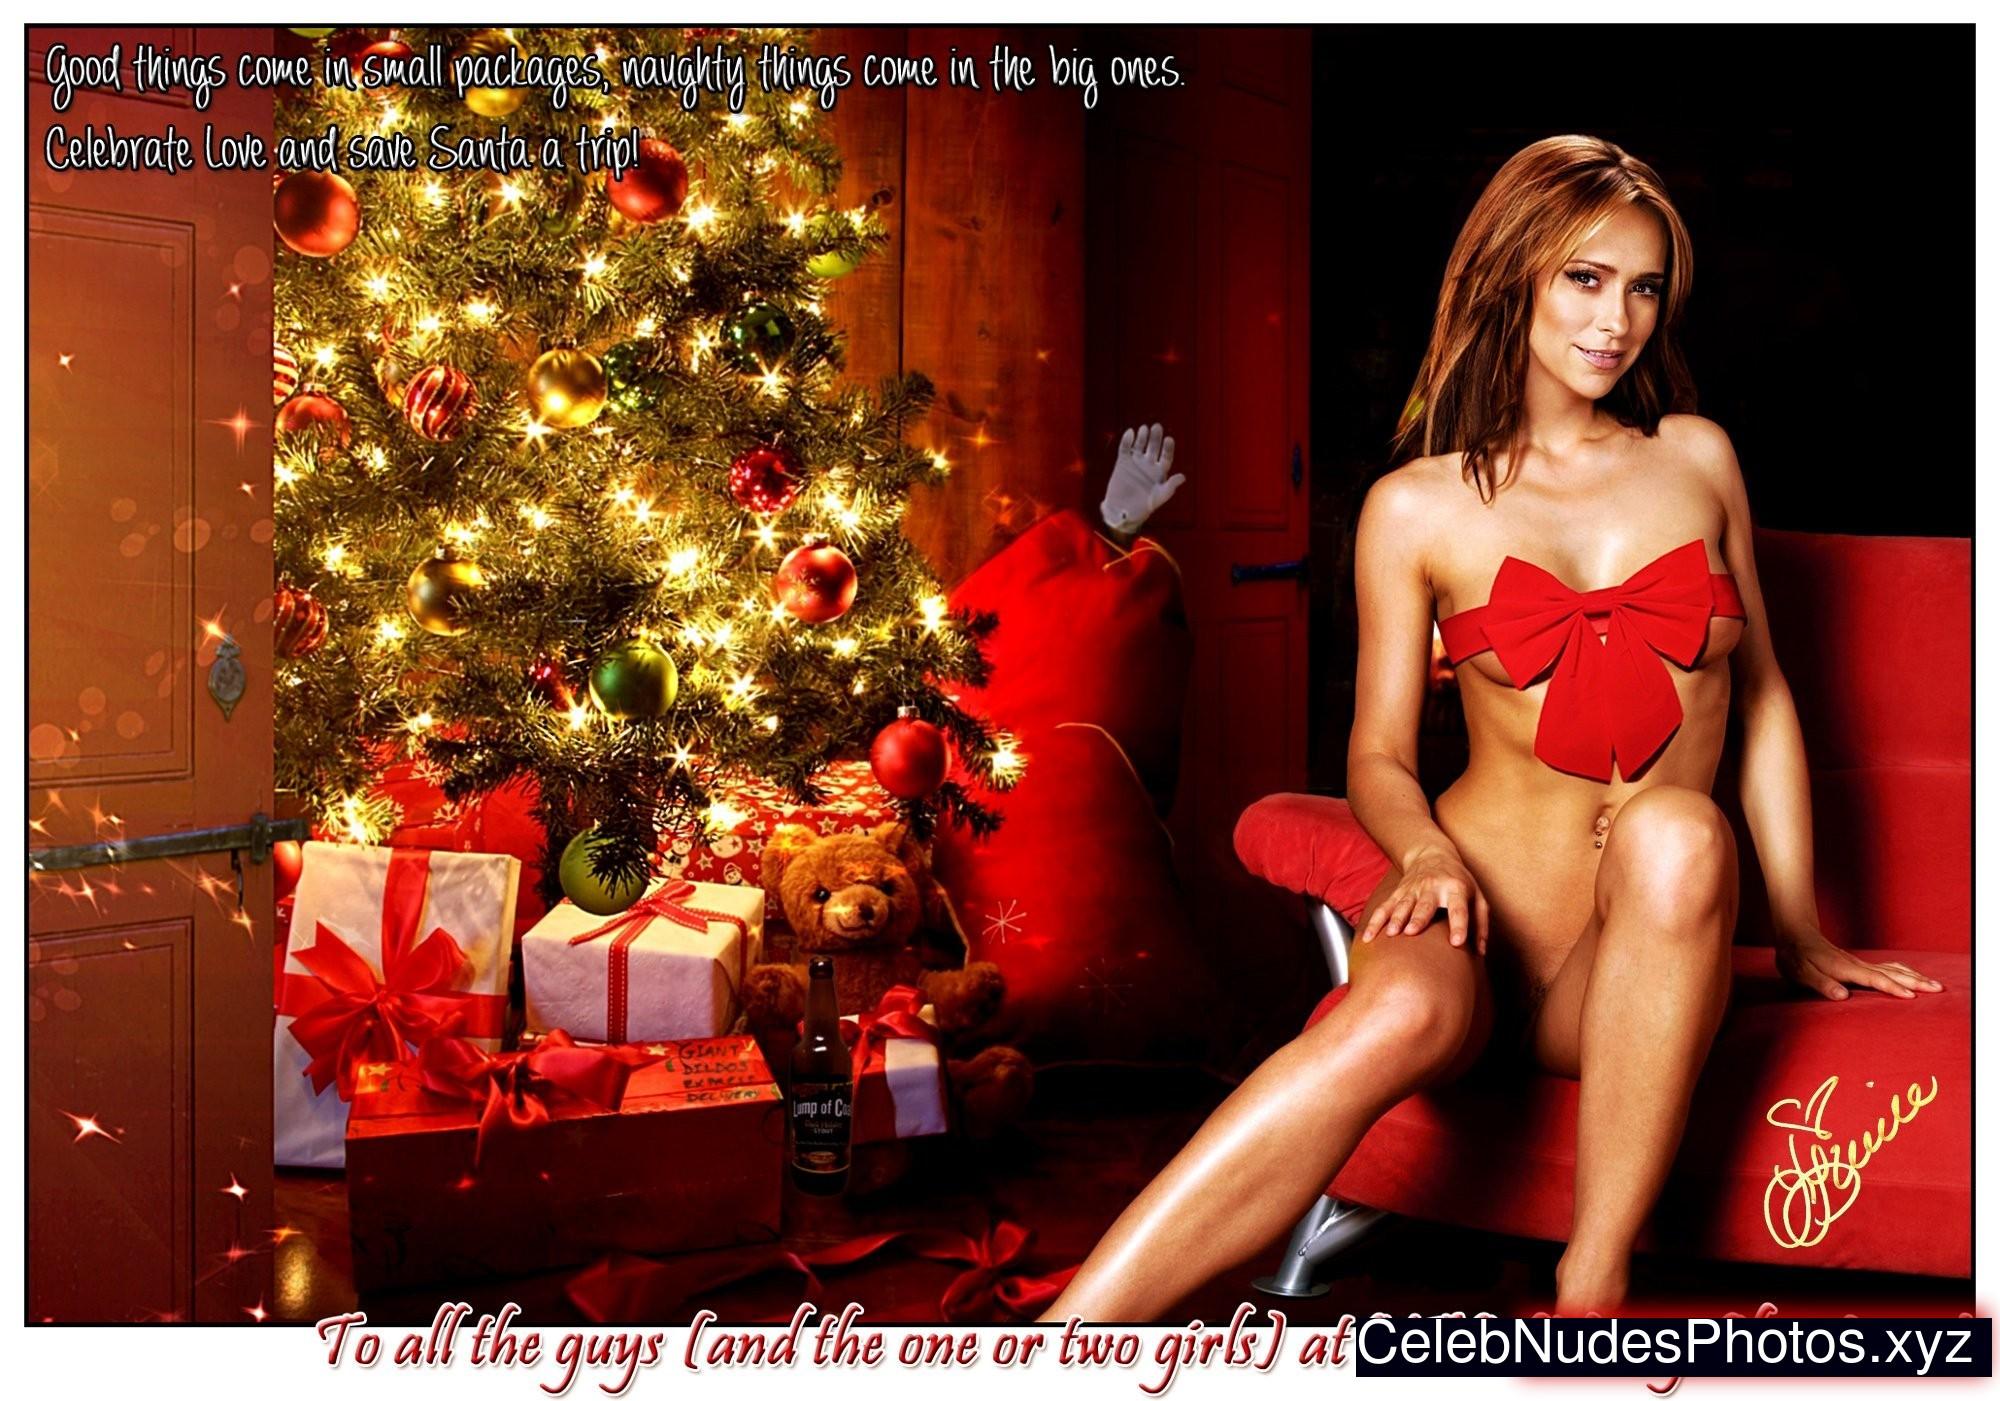 Jennifer love hewitt desnuda gratis pics 25